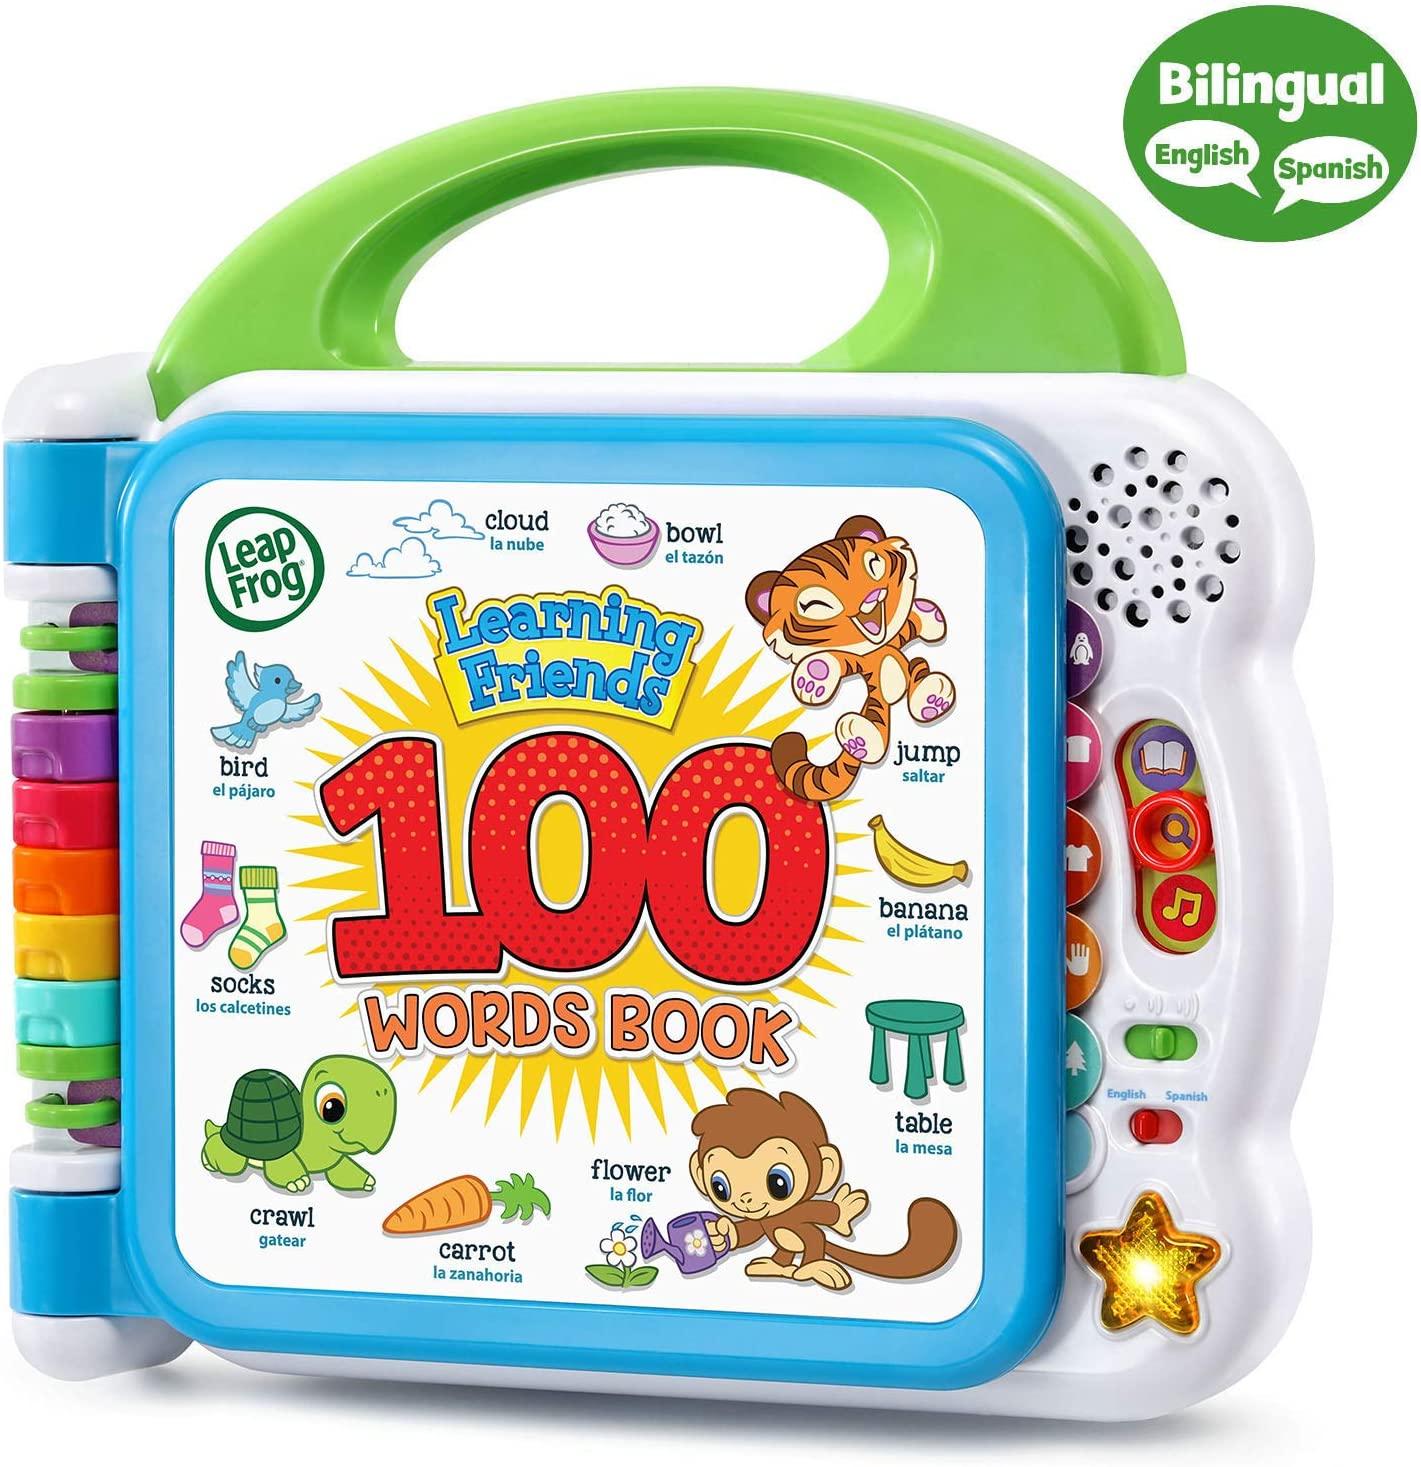 Laptop Chinese English Learning Computer Toy Boy Baby Girl Children Kid Gift UK